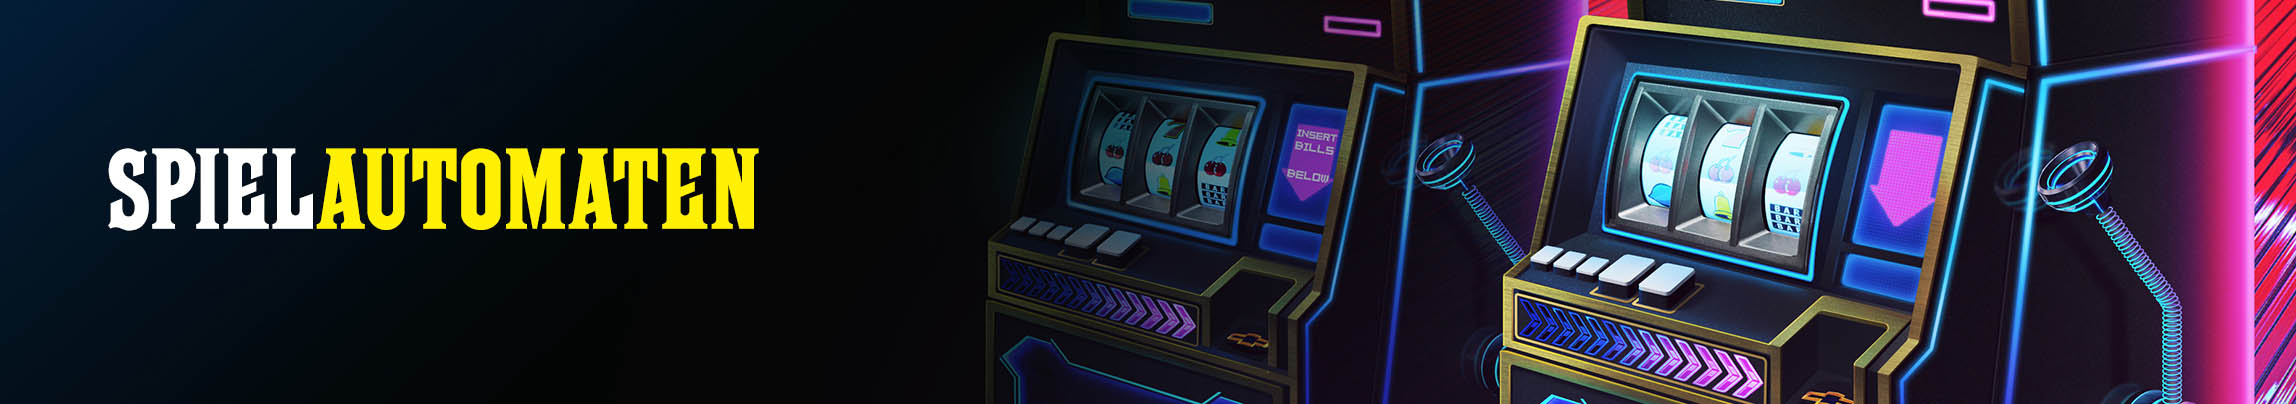 spielautomaten logo